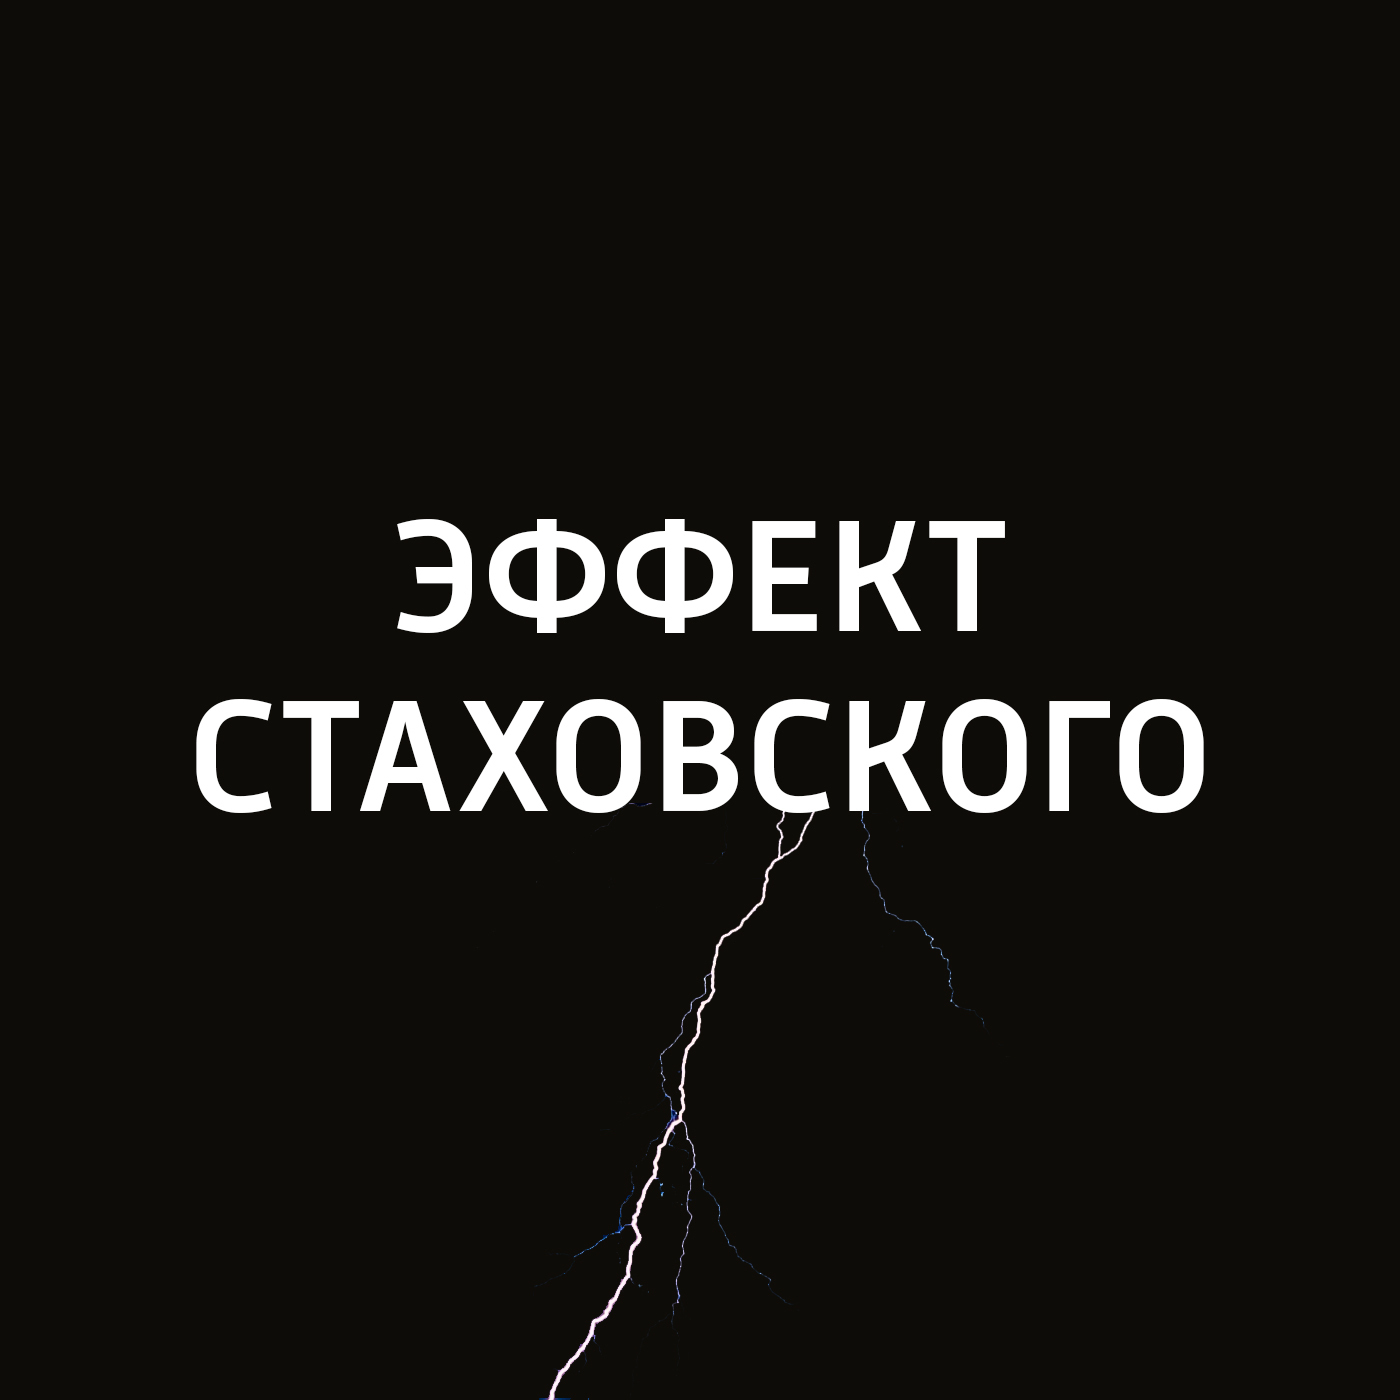 Евгений Стаховский Таблица Пифагора раннее развитие quercetti тубус пифагора для изучения таблицы умножения